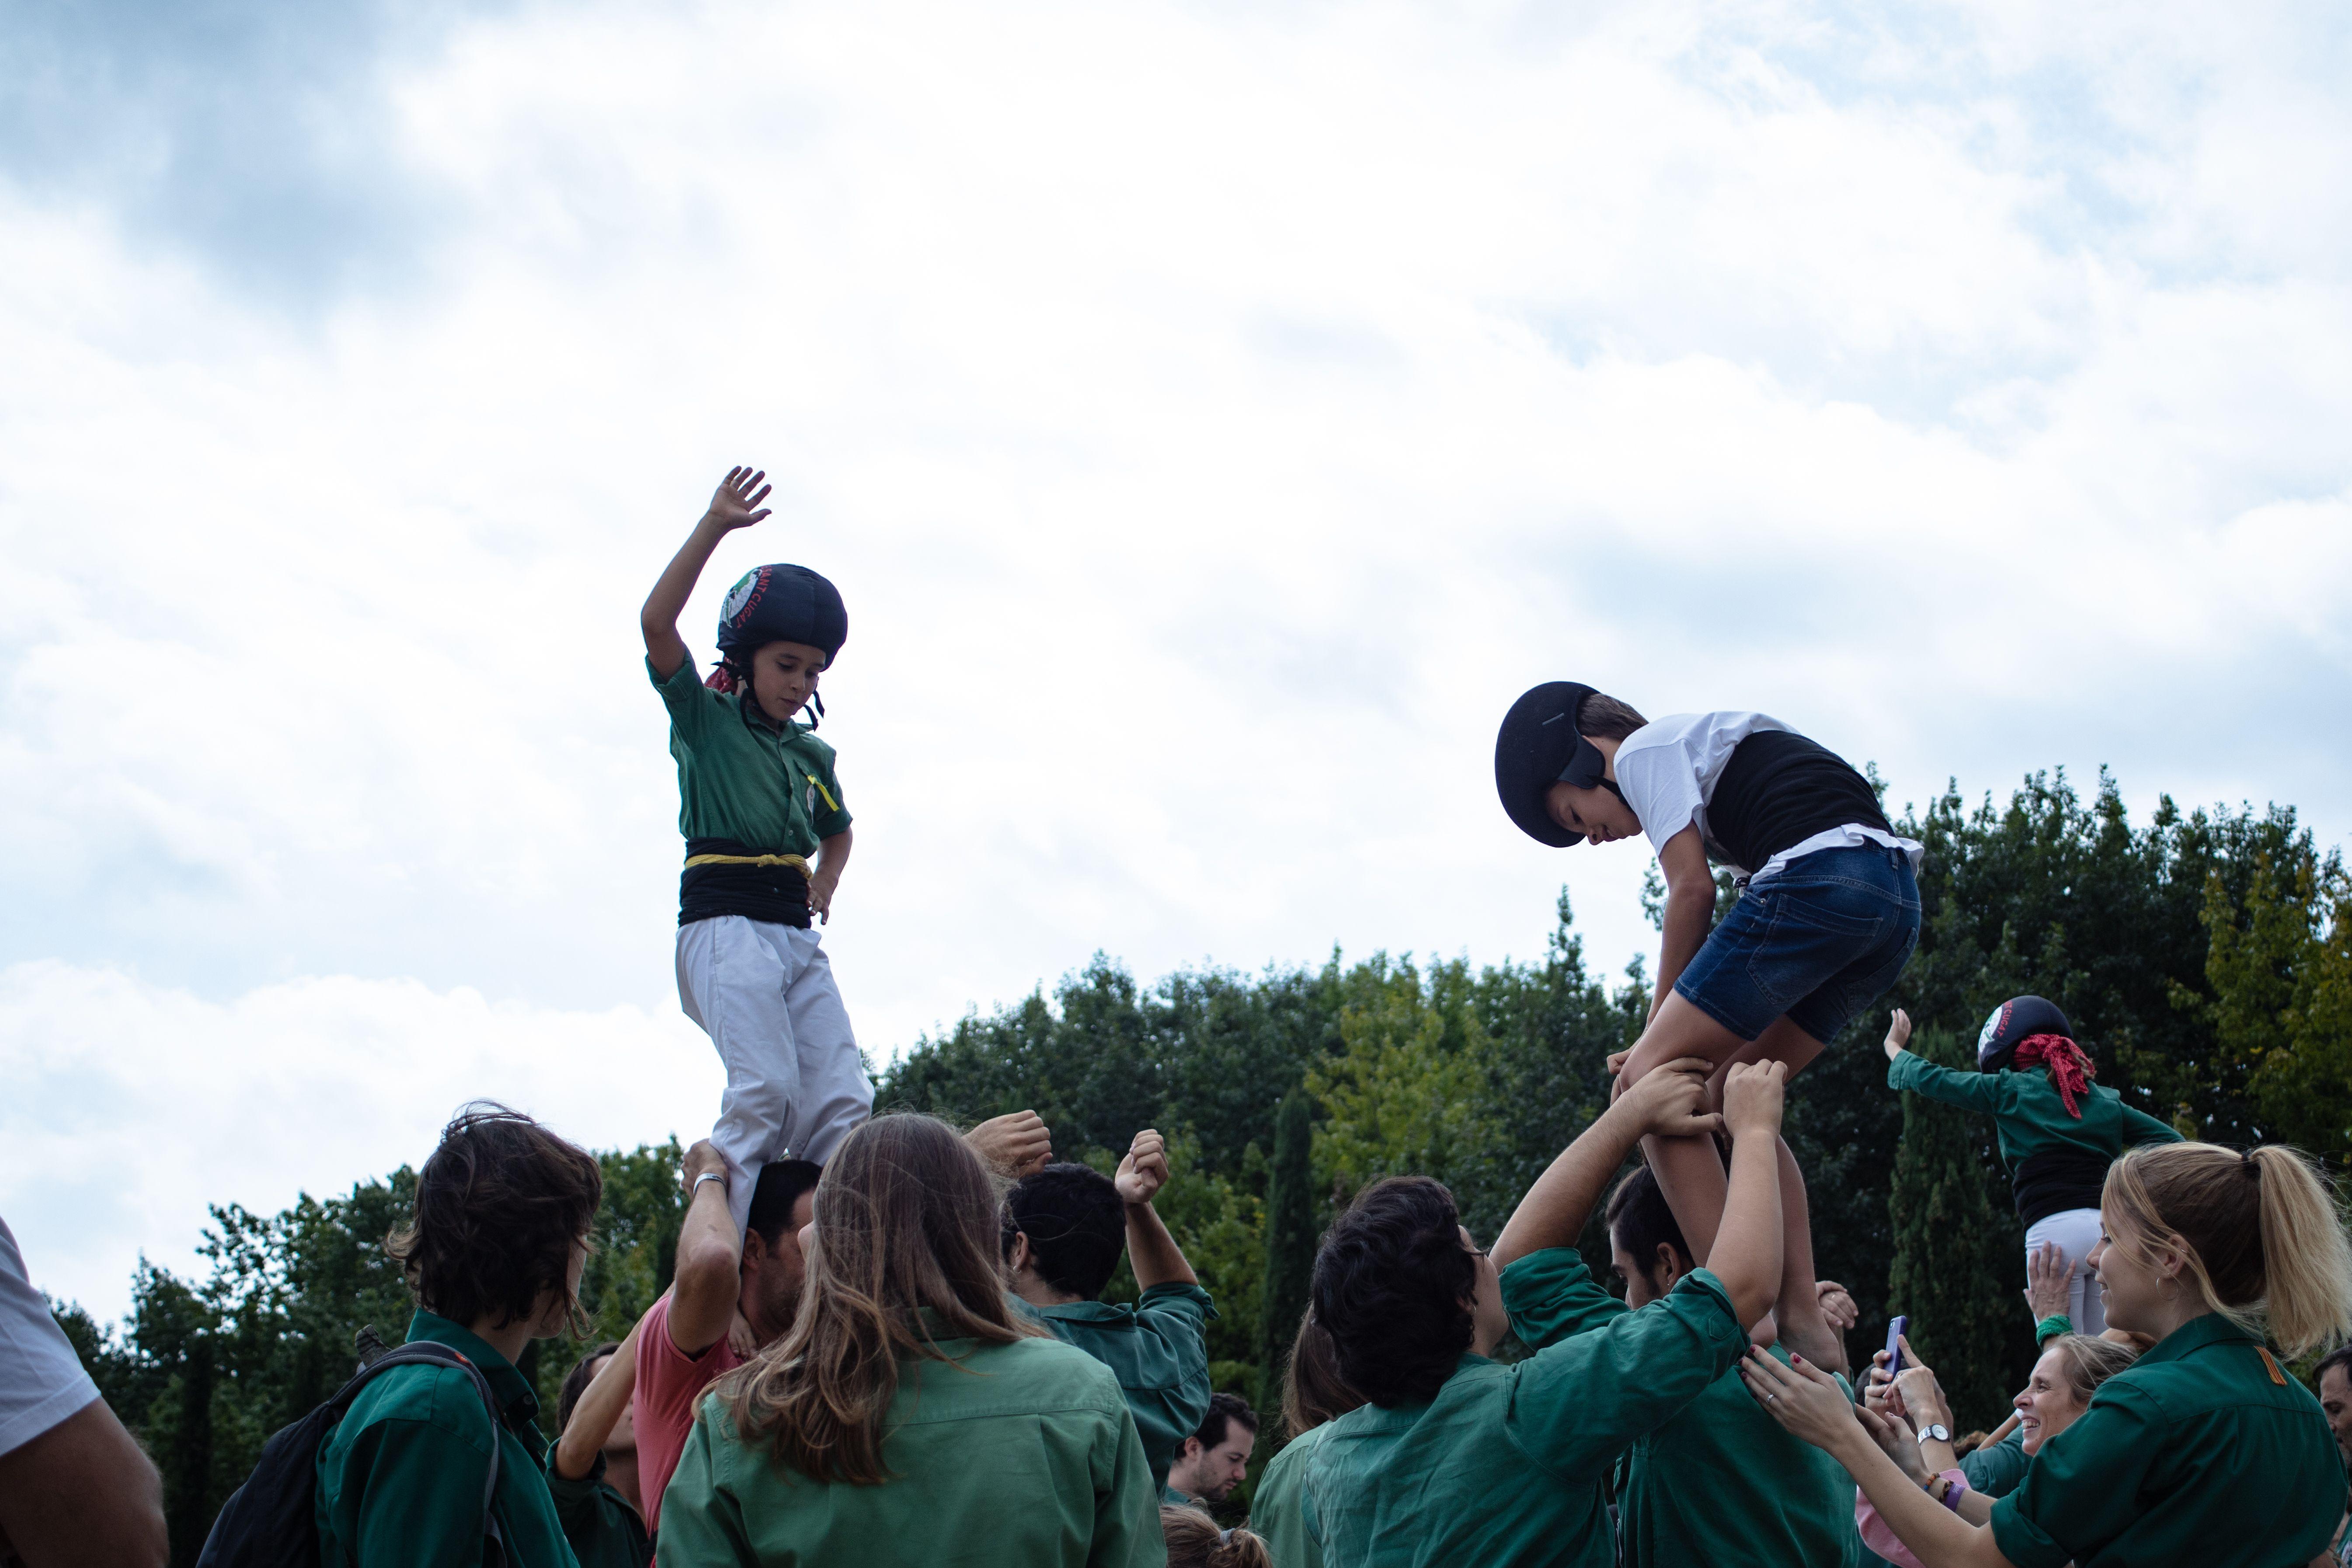 Petits Camaleons 2019. Diumenge. Foto: Adrián Gómez